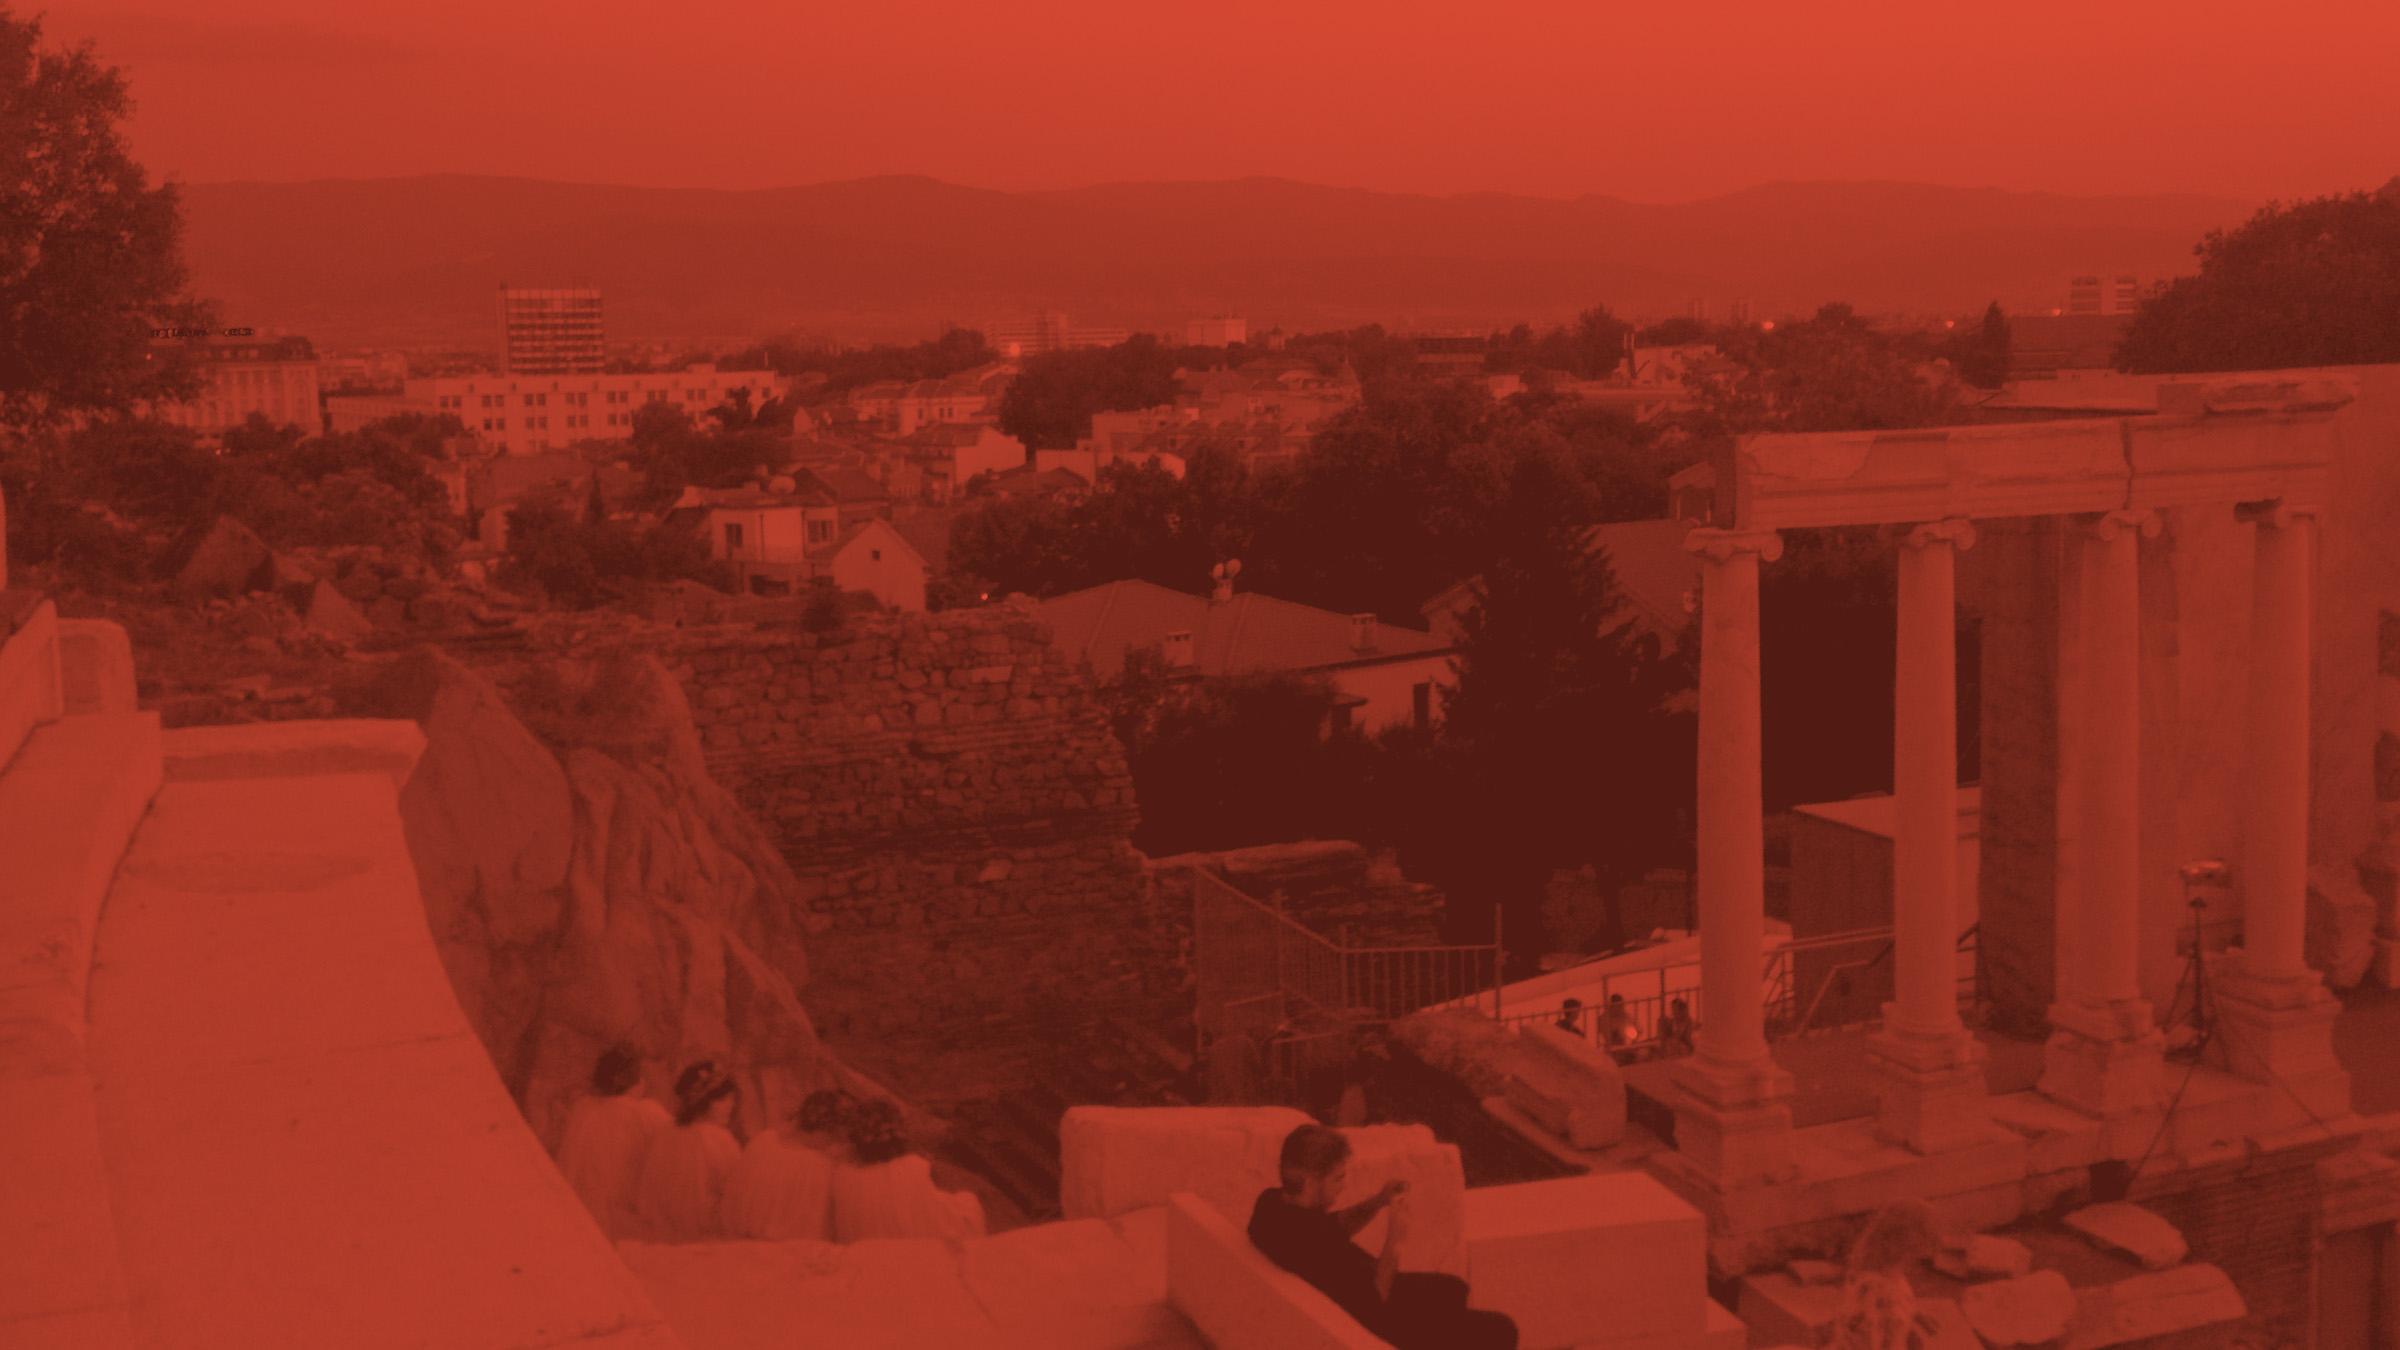 Kulturstrategie für die Stadt Plovdiv, Bulgarien